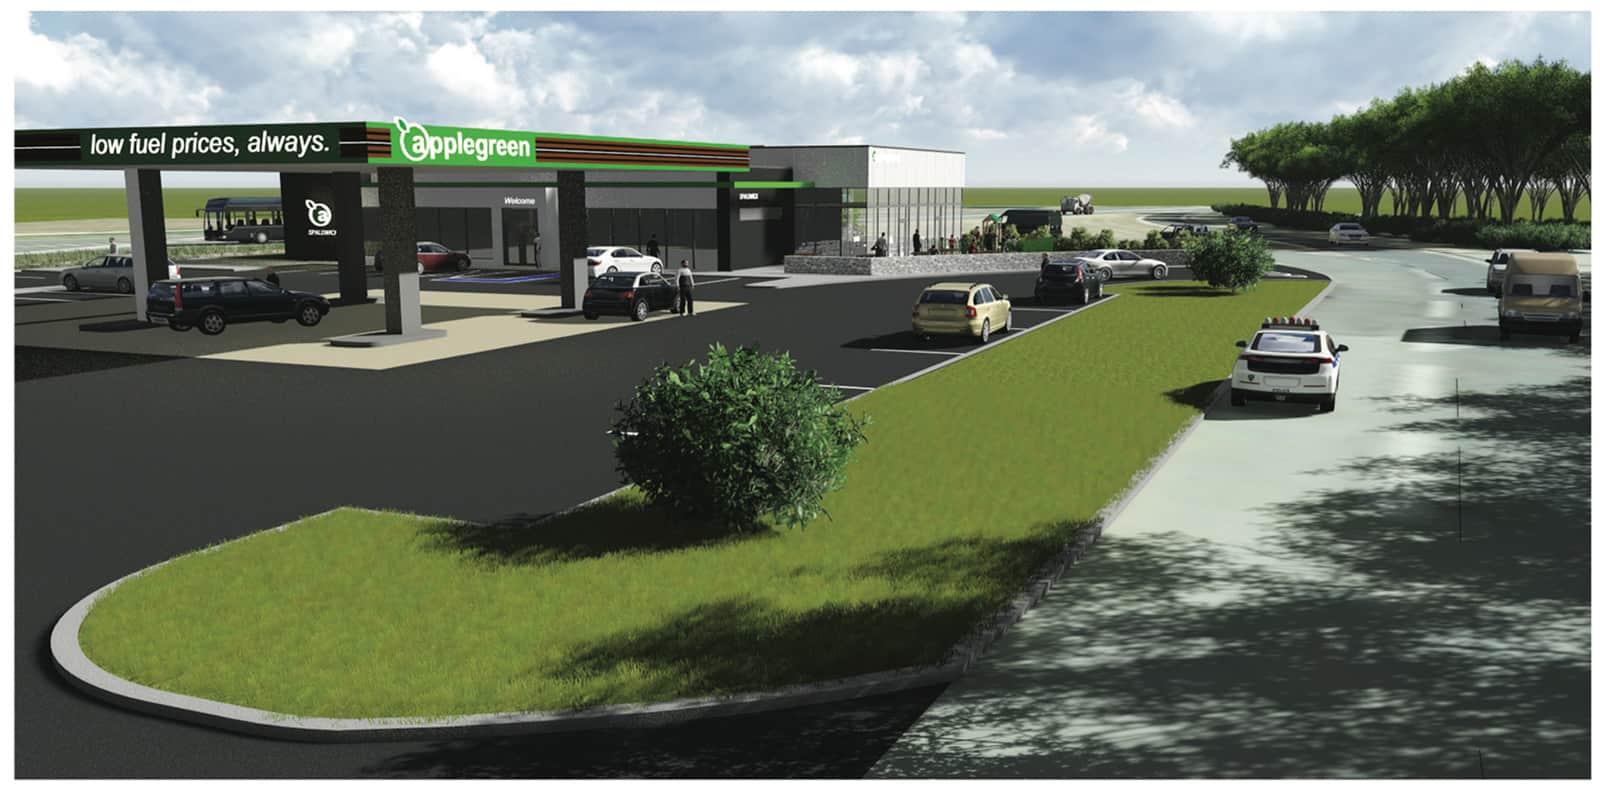 Plan for Spaldwick service station